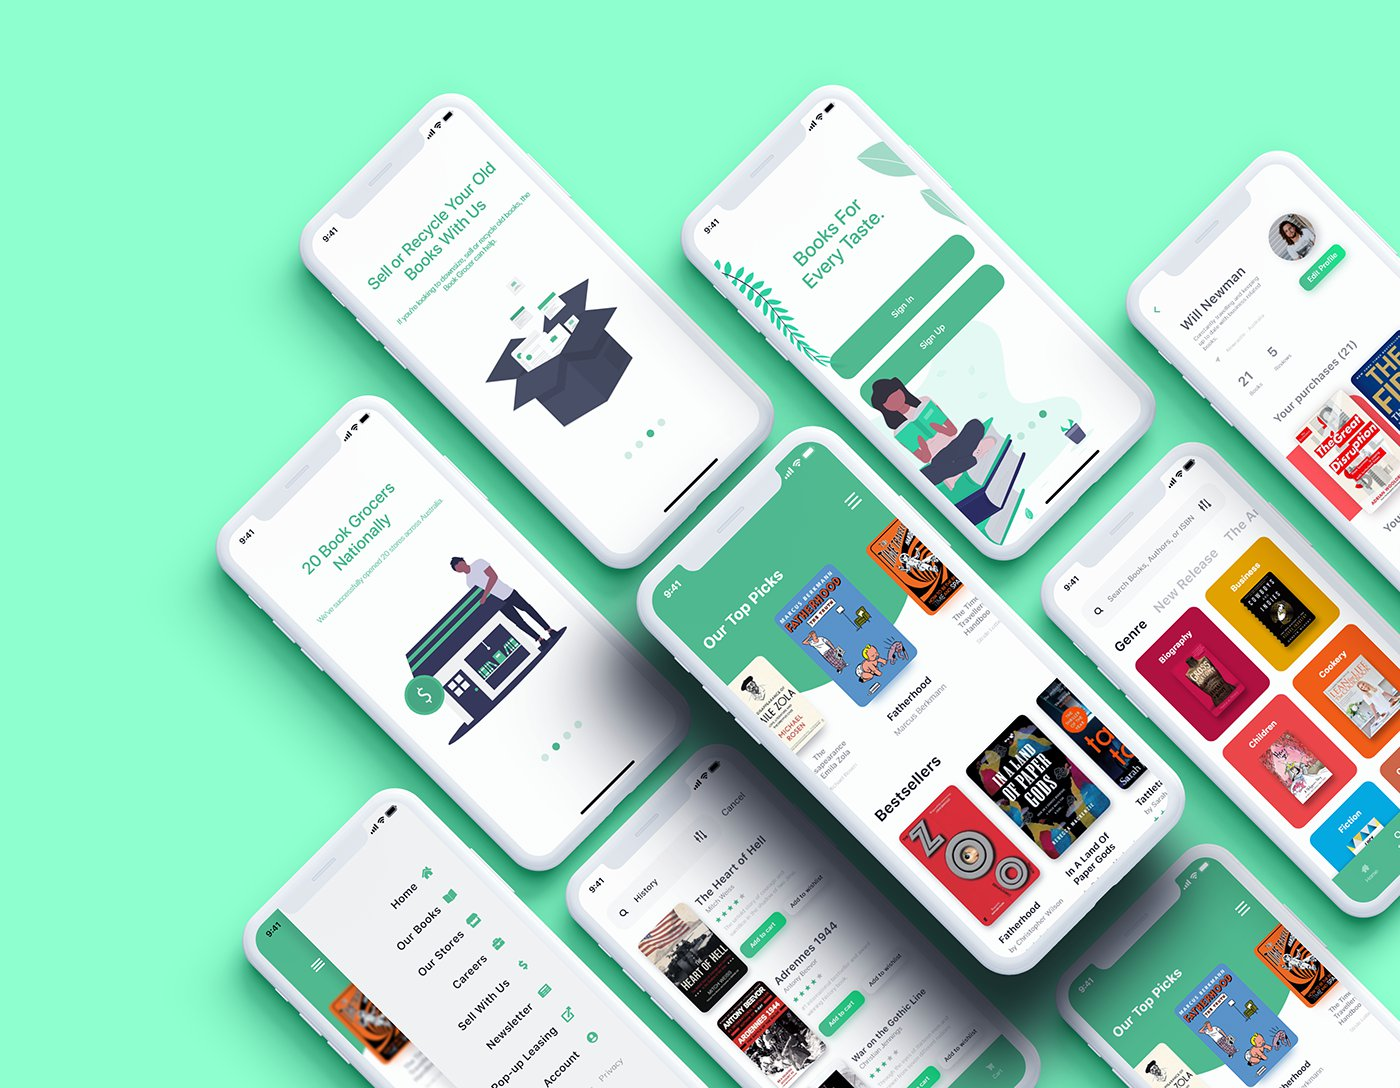 The Book Grocer App Design - Free Adobe XD UI Kit